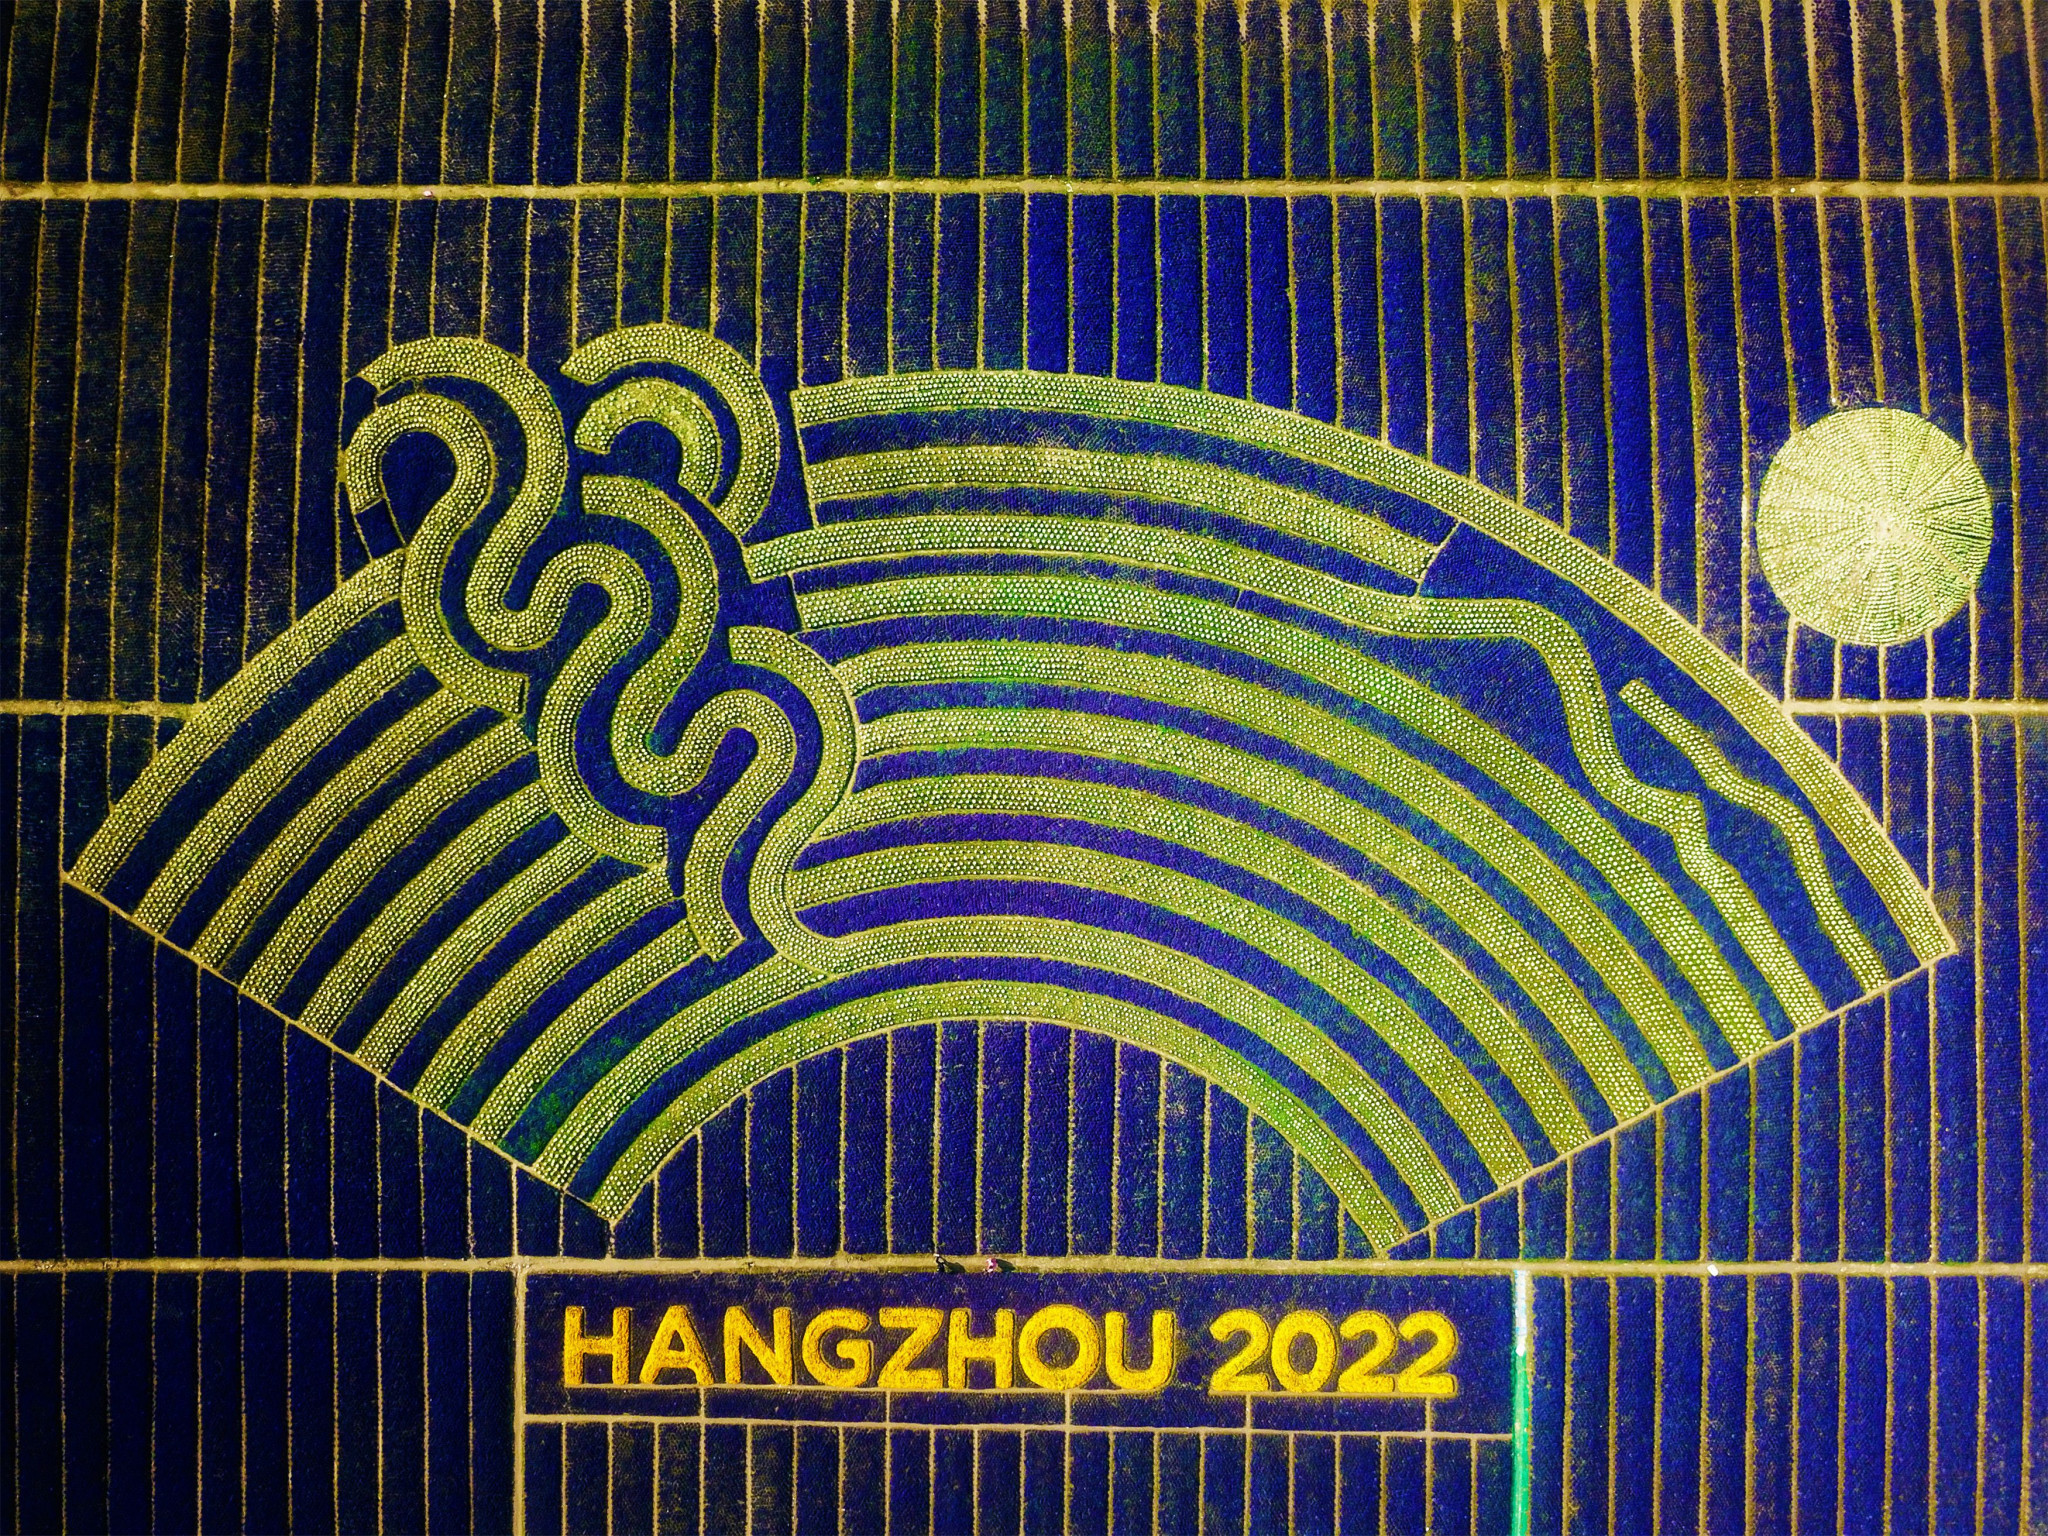 Construction begins on Hangzhou 2022 baseball and softball stadium